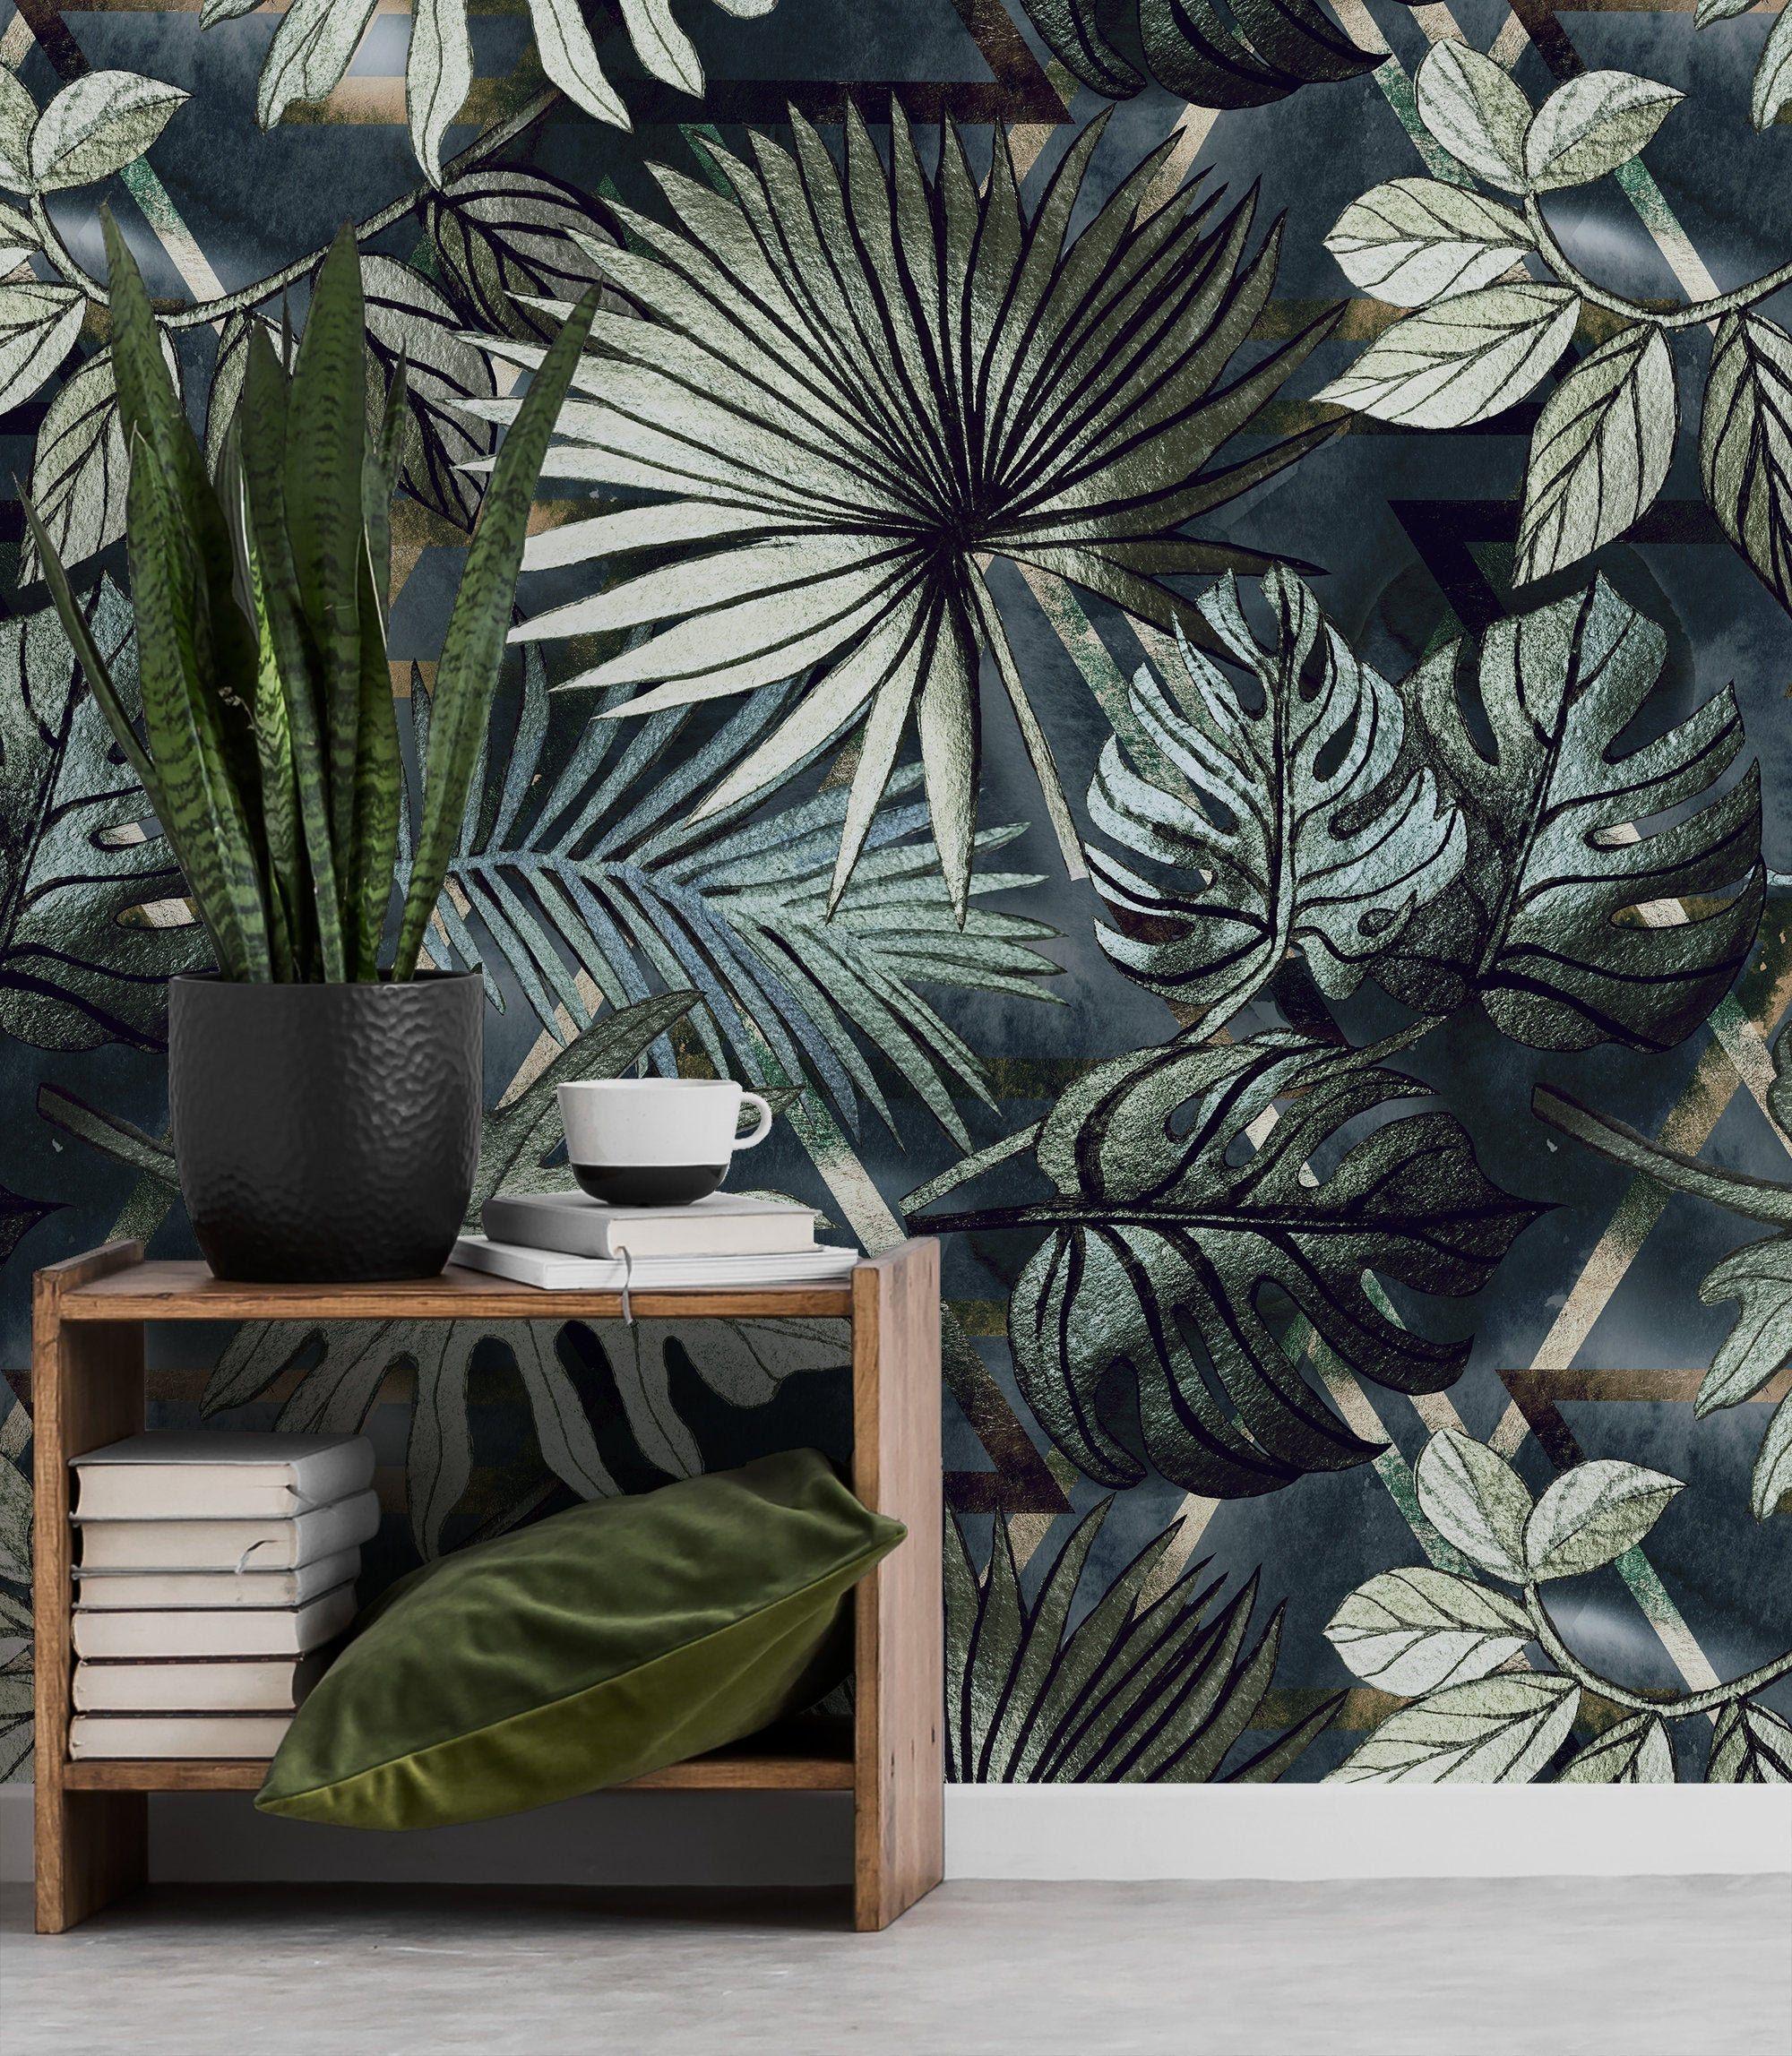 Vintage Tropical Leaves Wallpaper Self Adhesive Jungle Wall Etsy Leaf Wallpaper Jungle Wall Mural Wallpaper